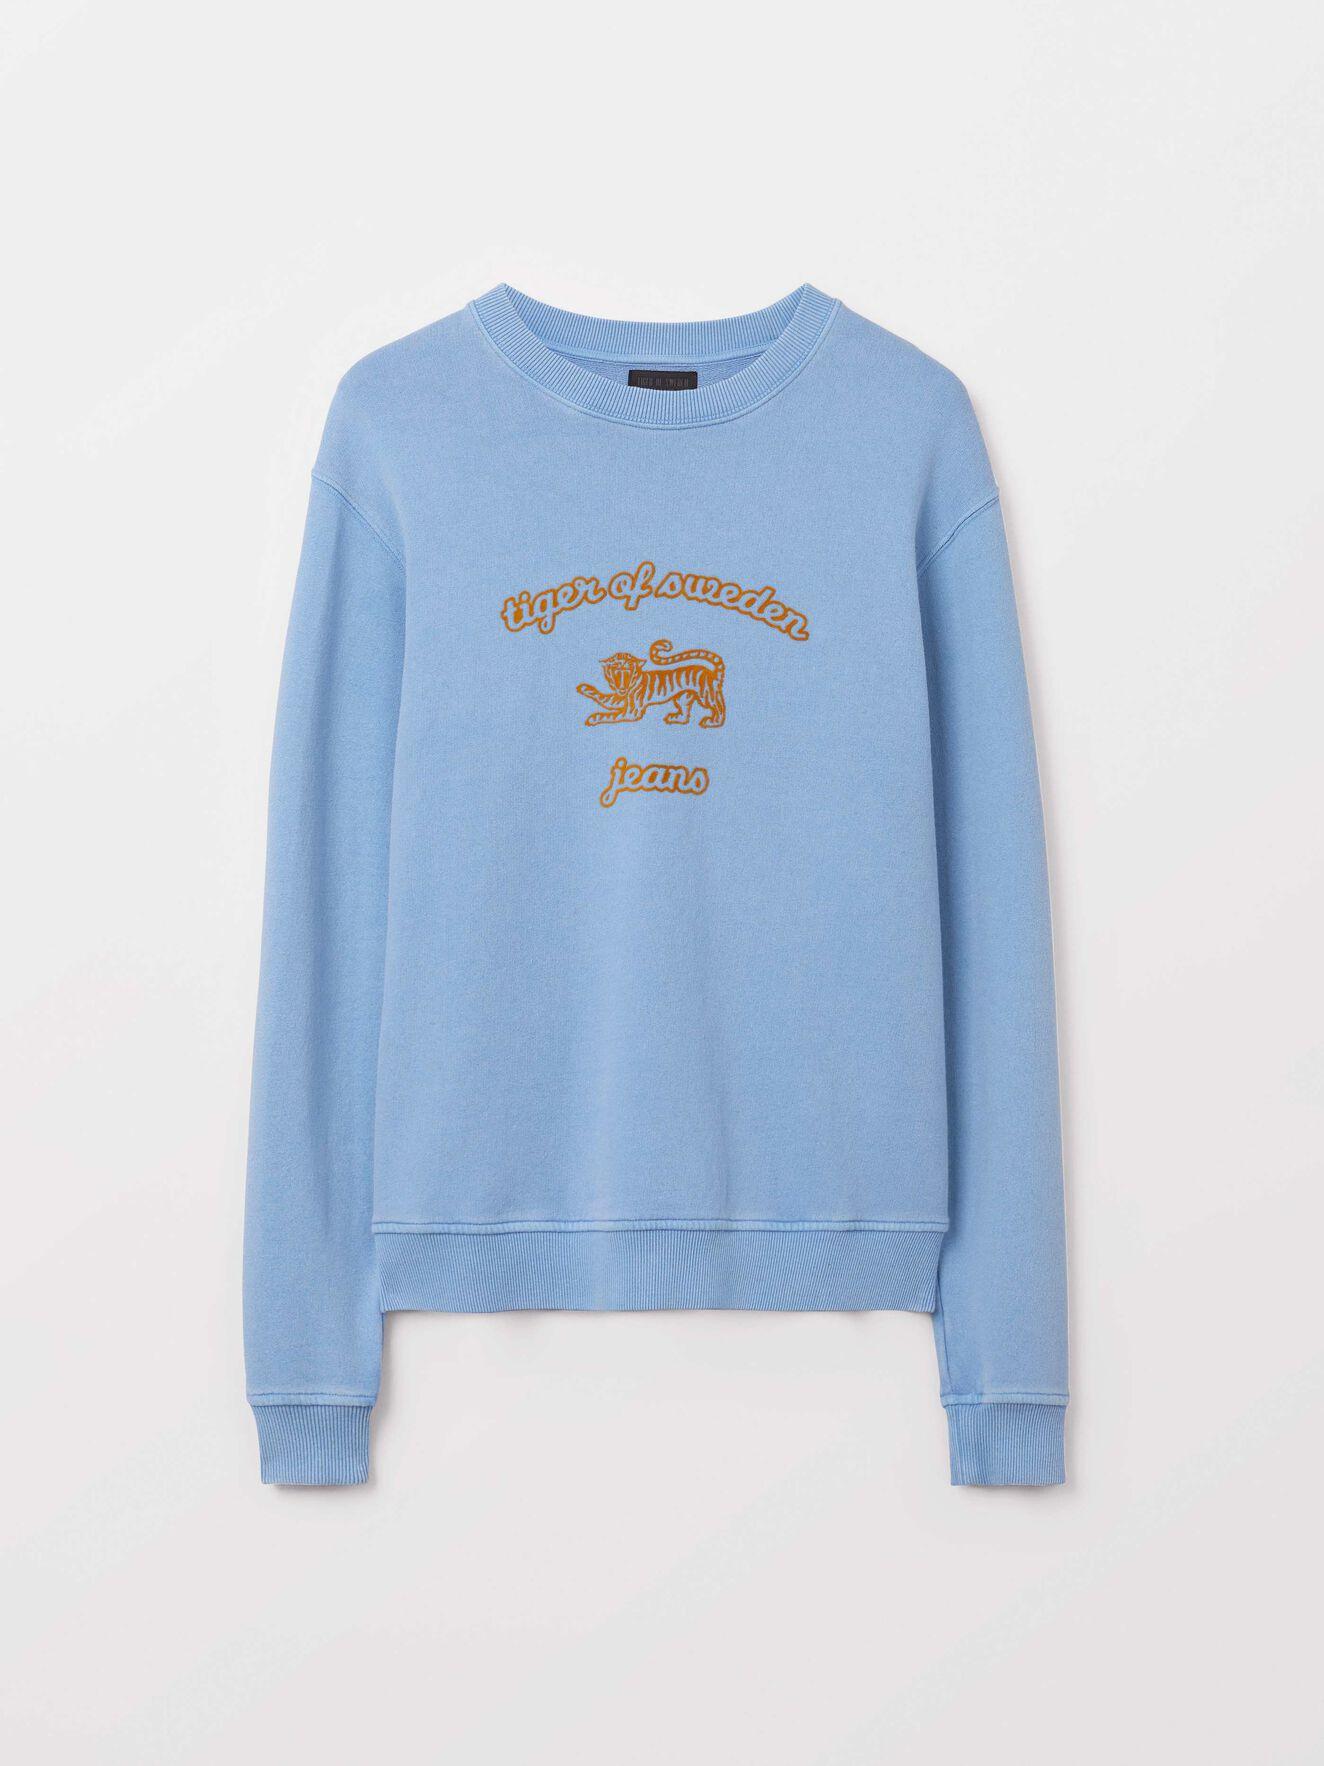 Tana O Sweatshirt in True Sailor from Tiger of Sweden